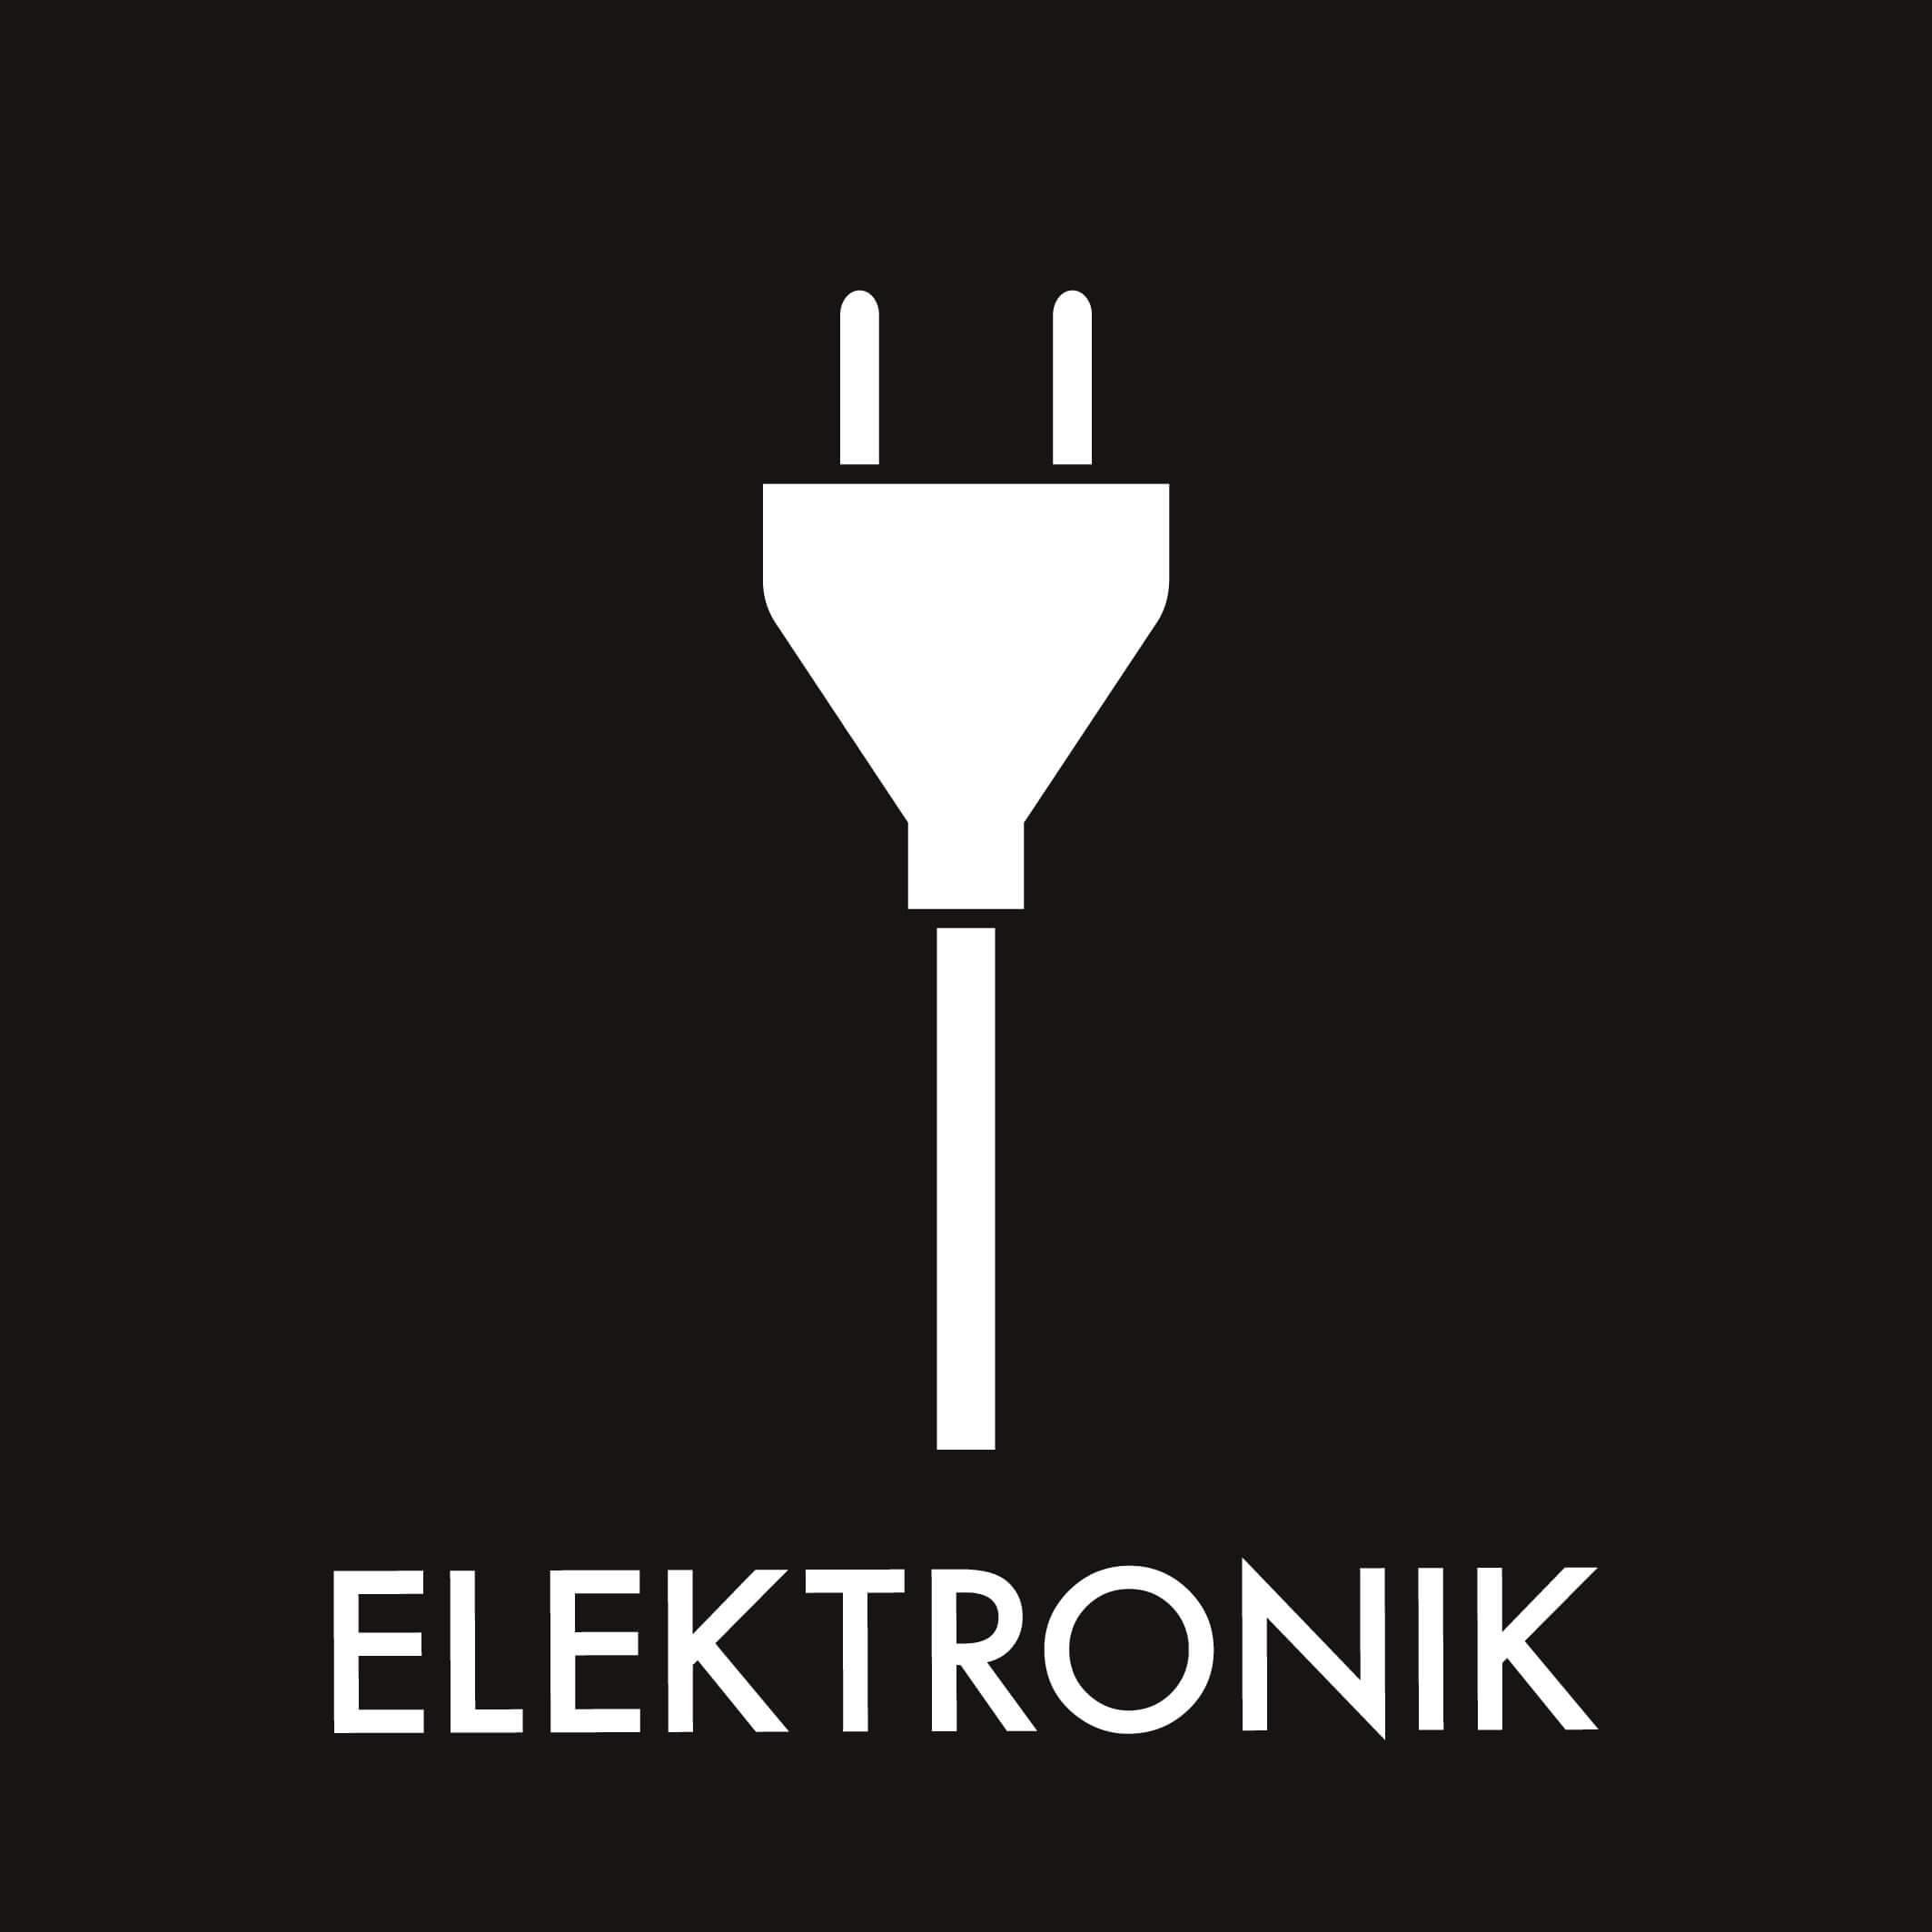 Dansk Affaldssortering - Elektronik sort